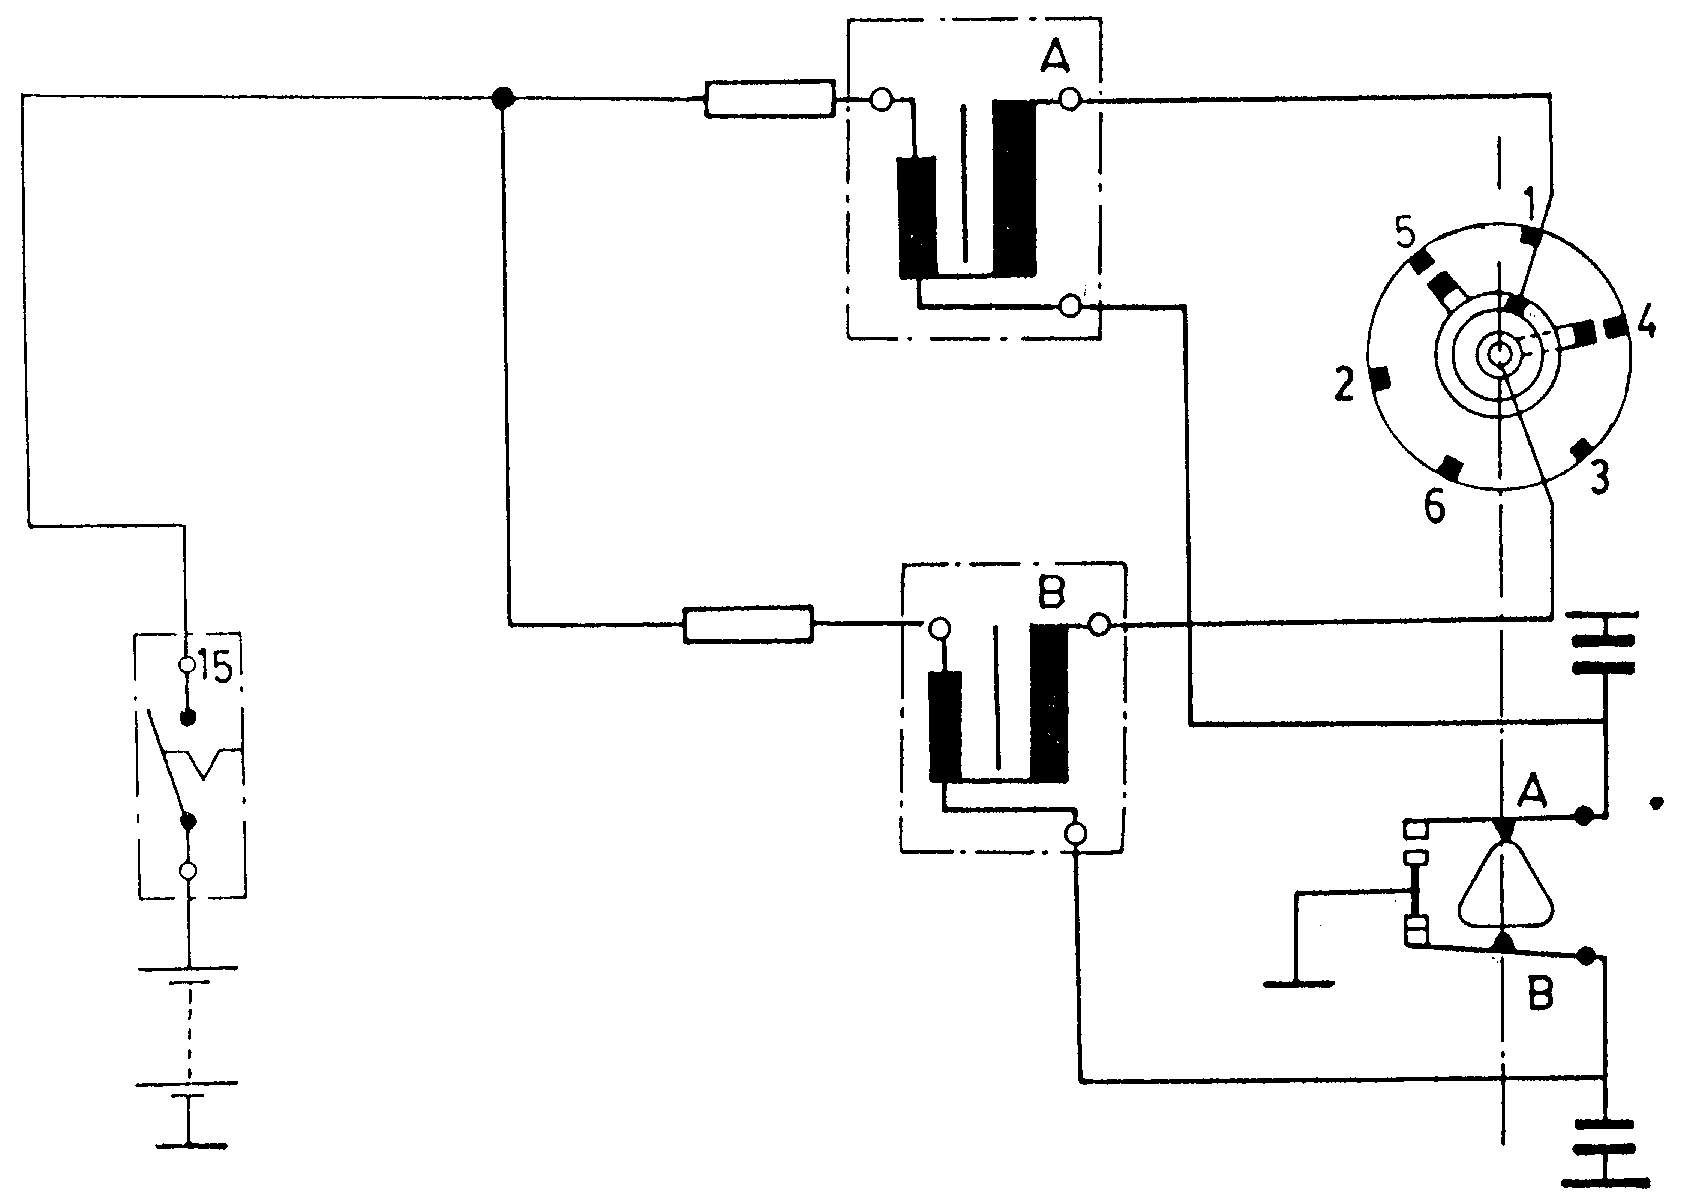 Kumpulan gambar wiring diagram sepeda motor terbaru codot modifikasi ottomotif cheapraybanclubmaster Image collections